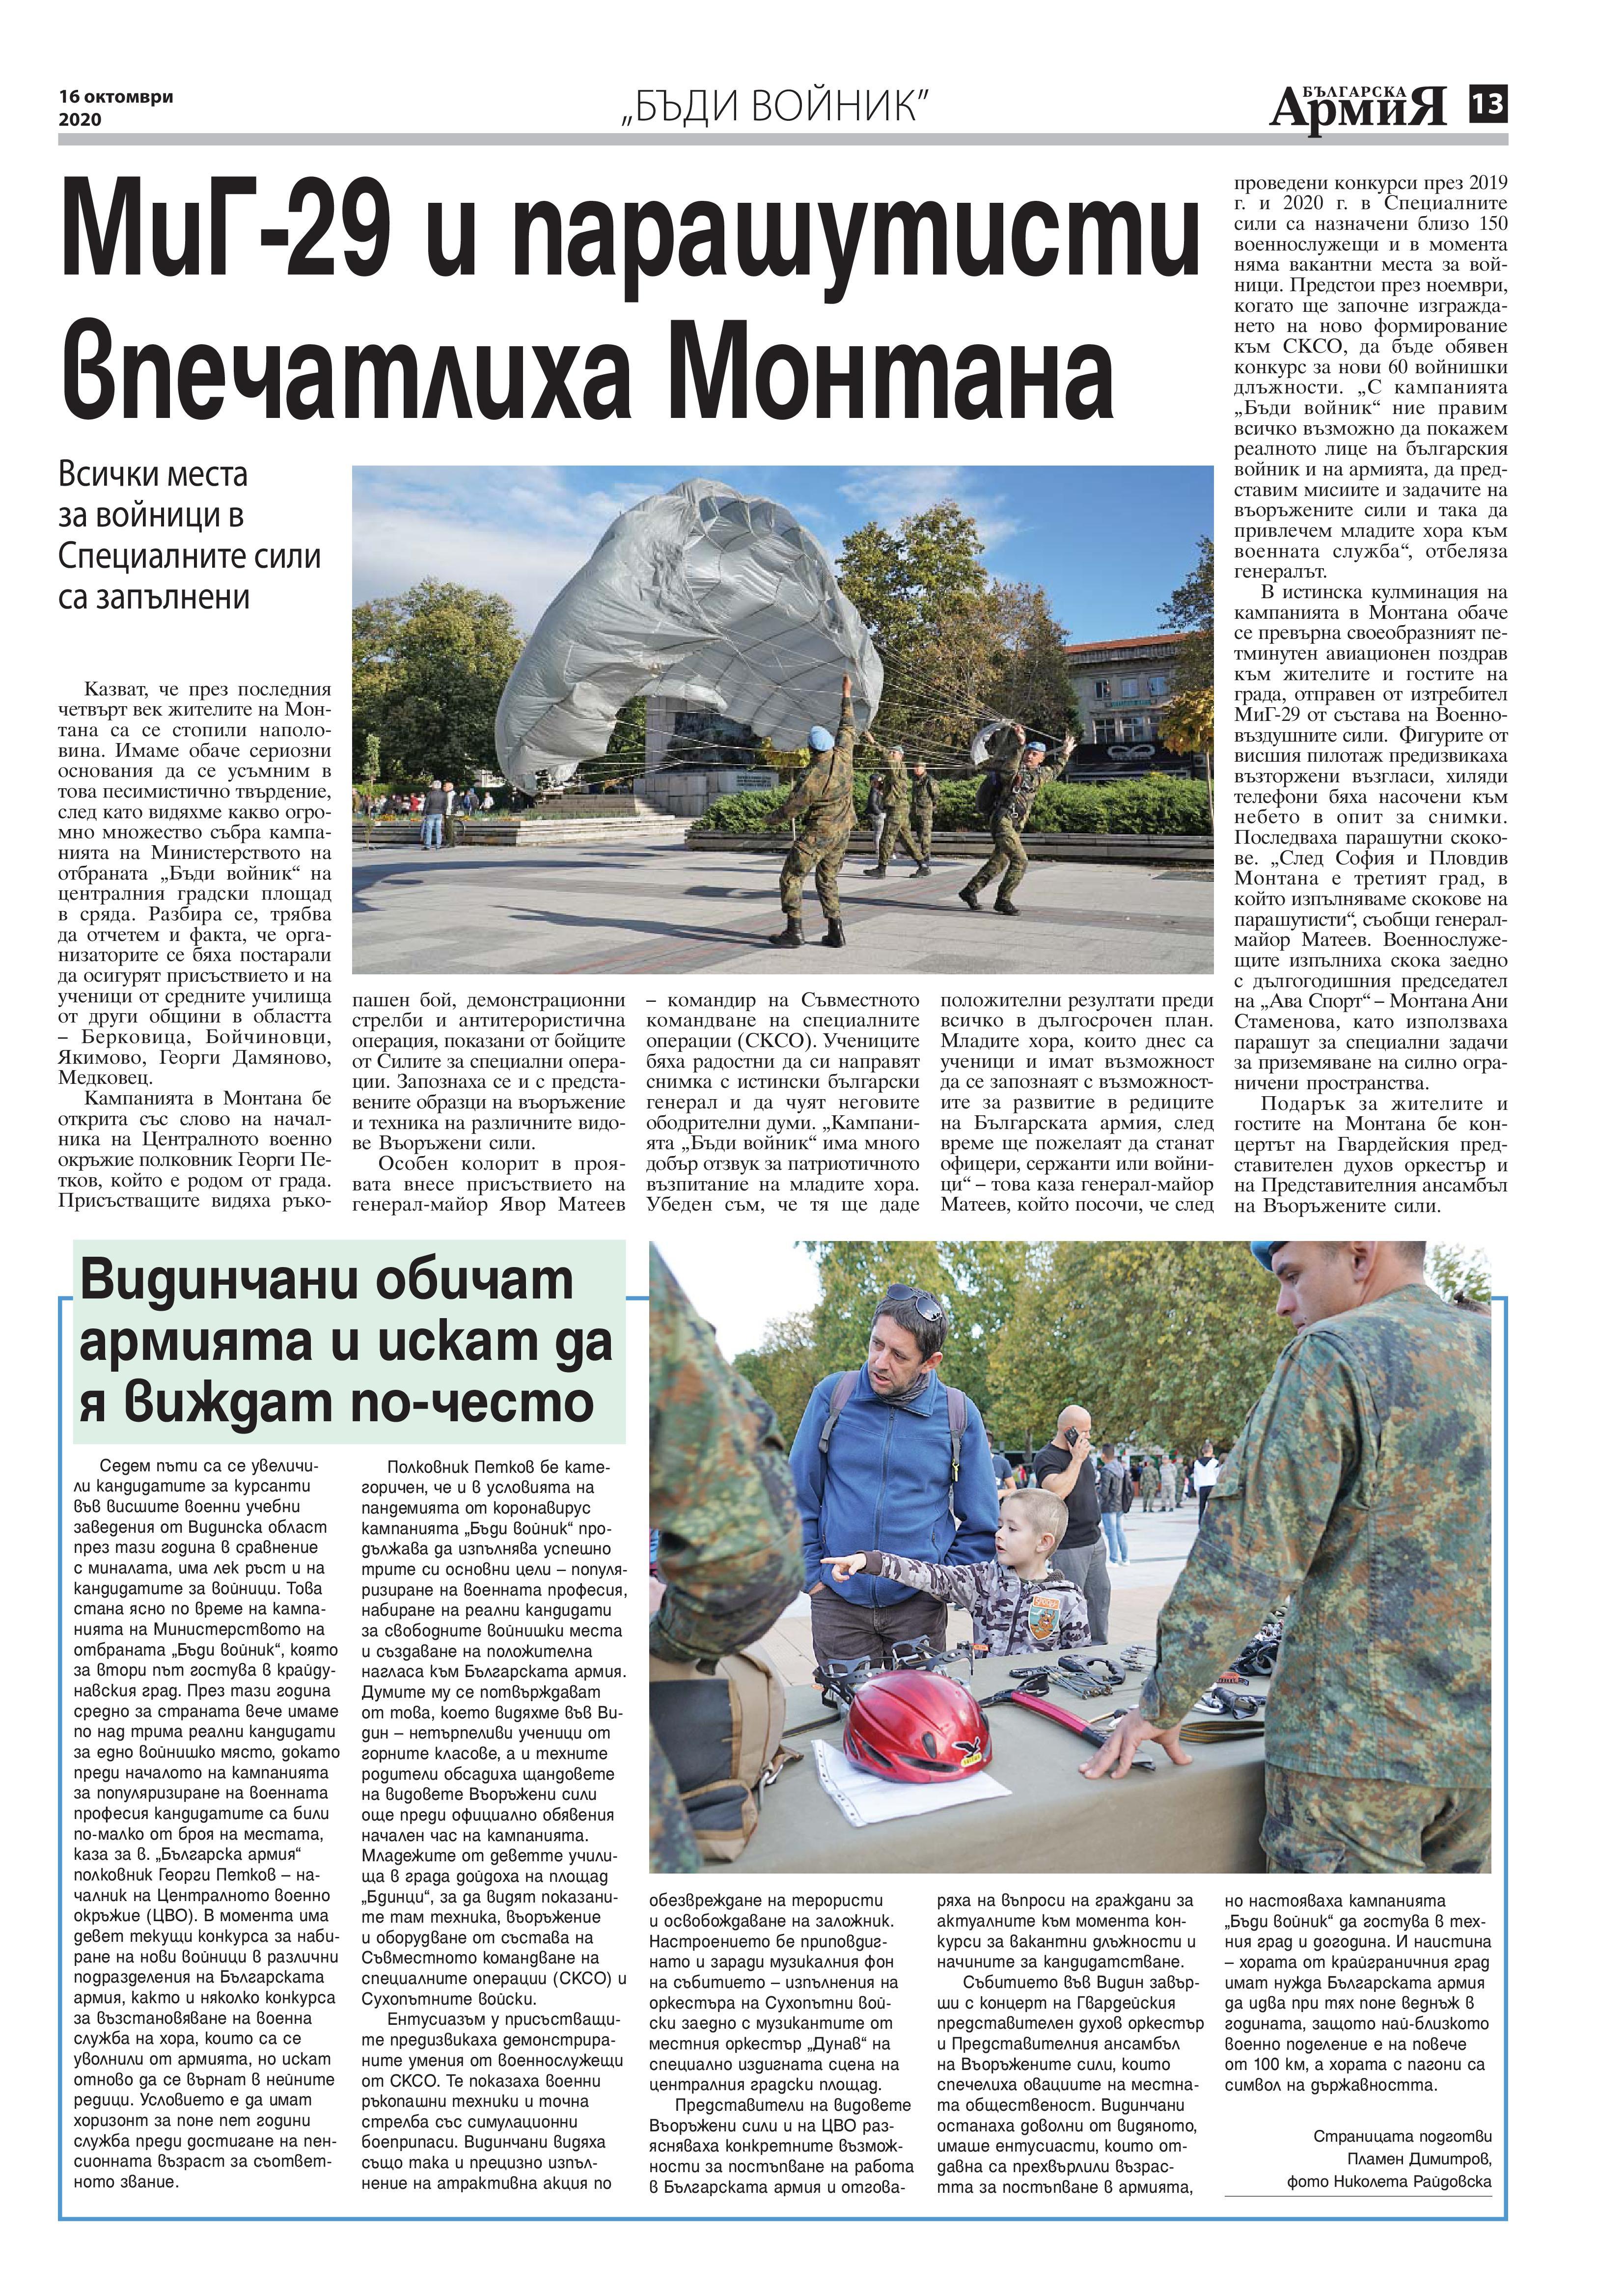 https://www.armymedia.bg/wp-content/uploads/2015/06/13-44.jpg